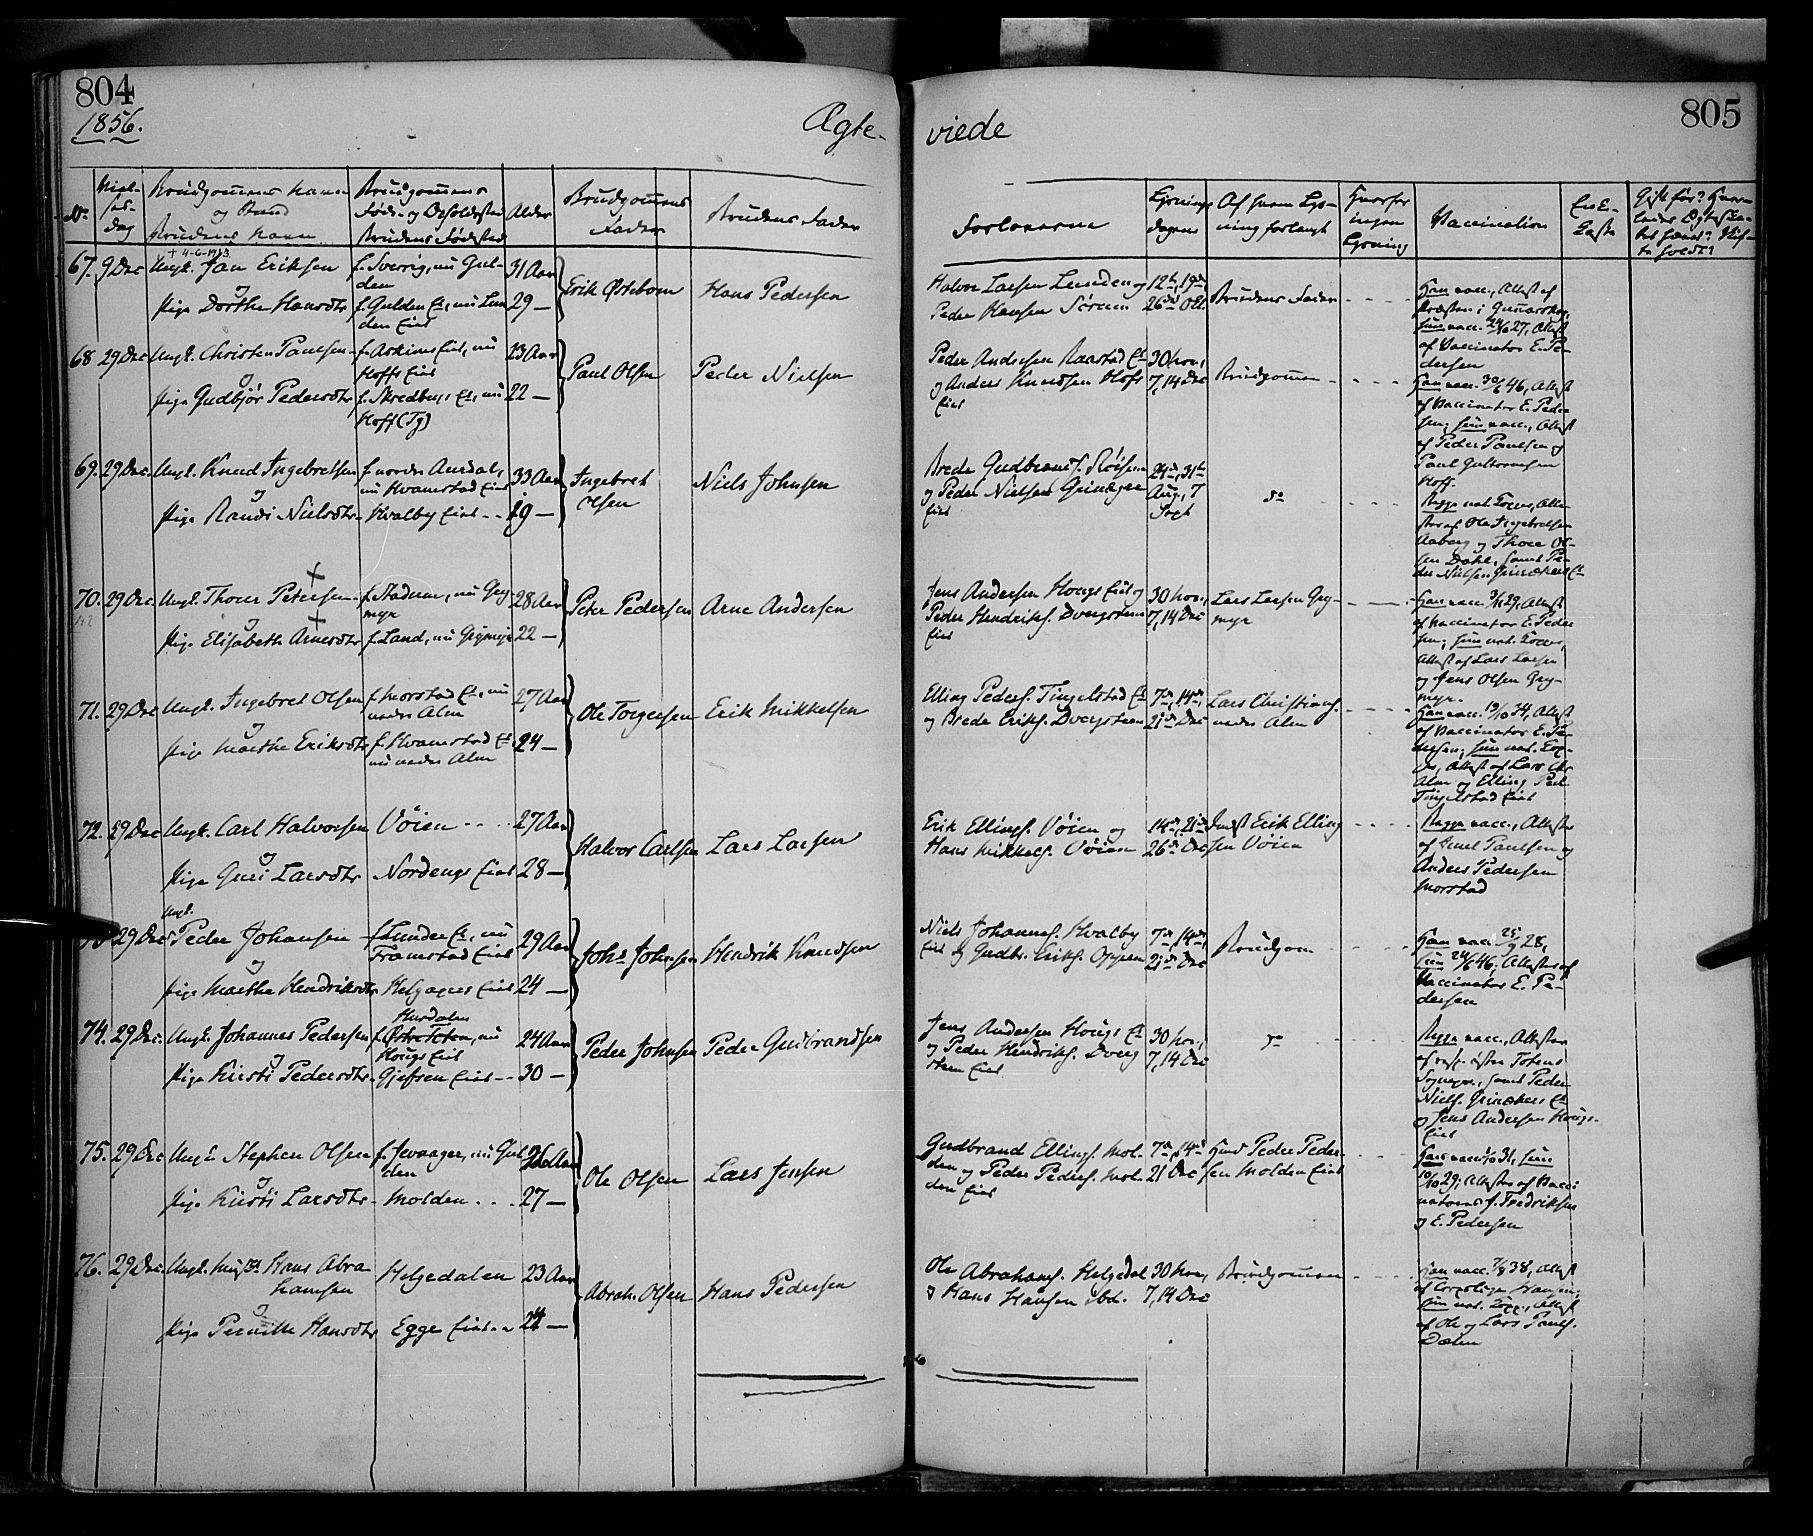 SAH, Gran prestekontor, Ministerialbok nr. 12, 1856-1874, s. 804-805